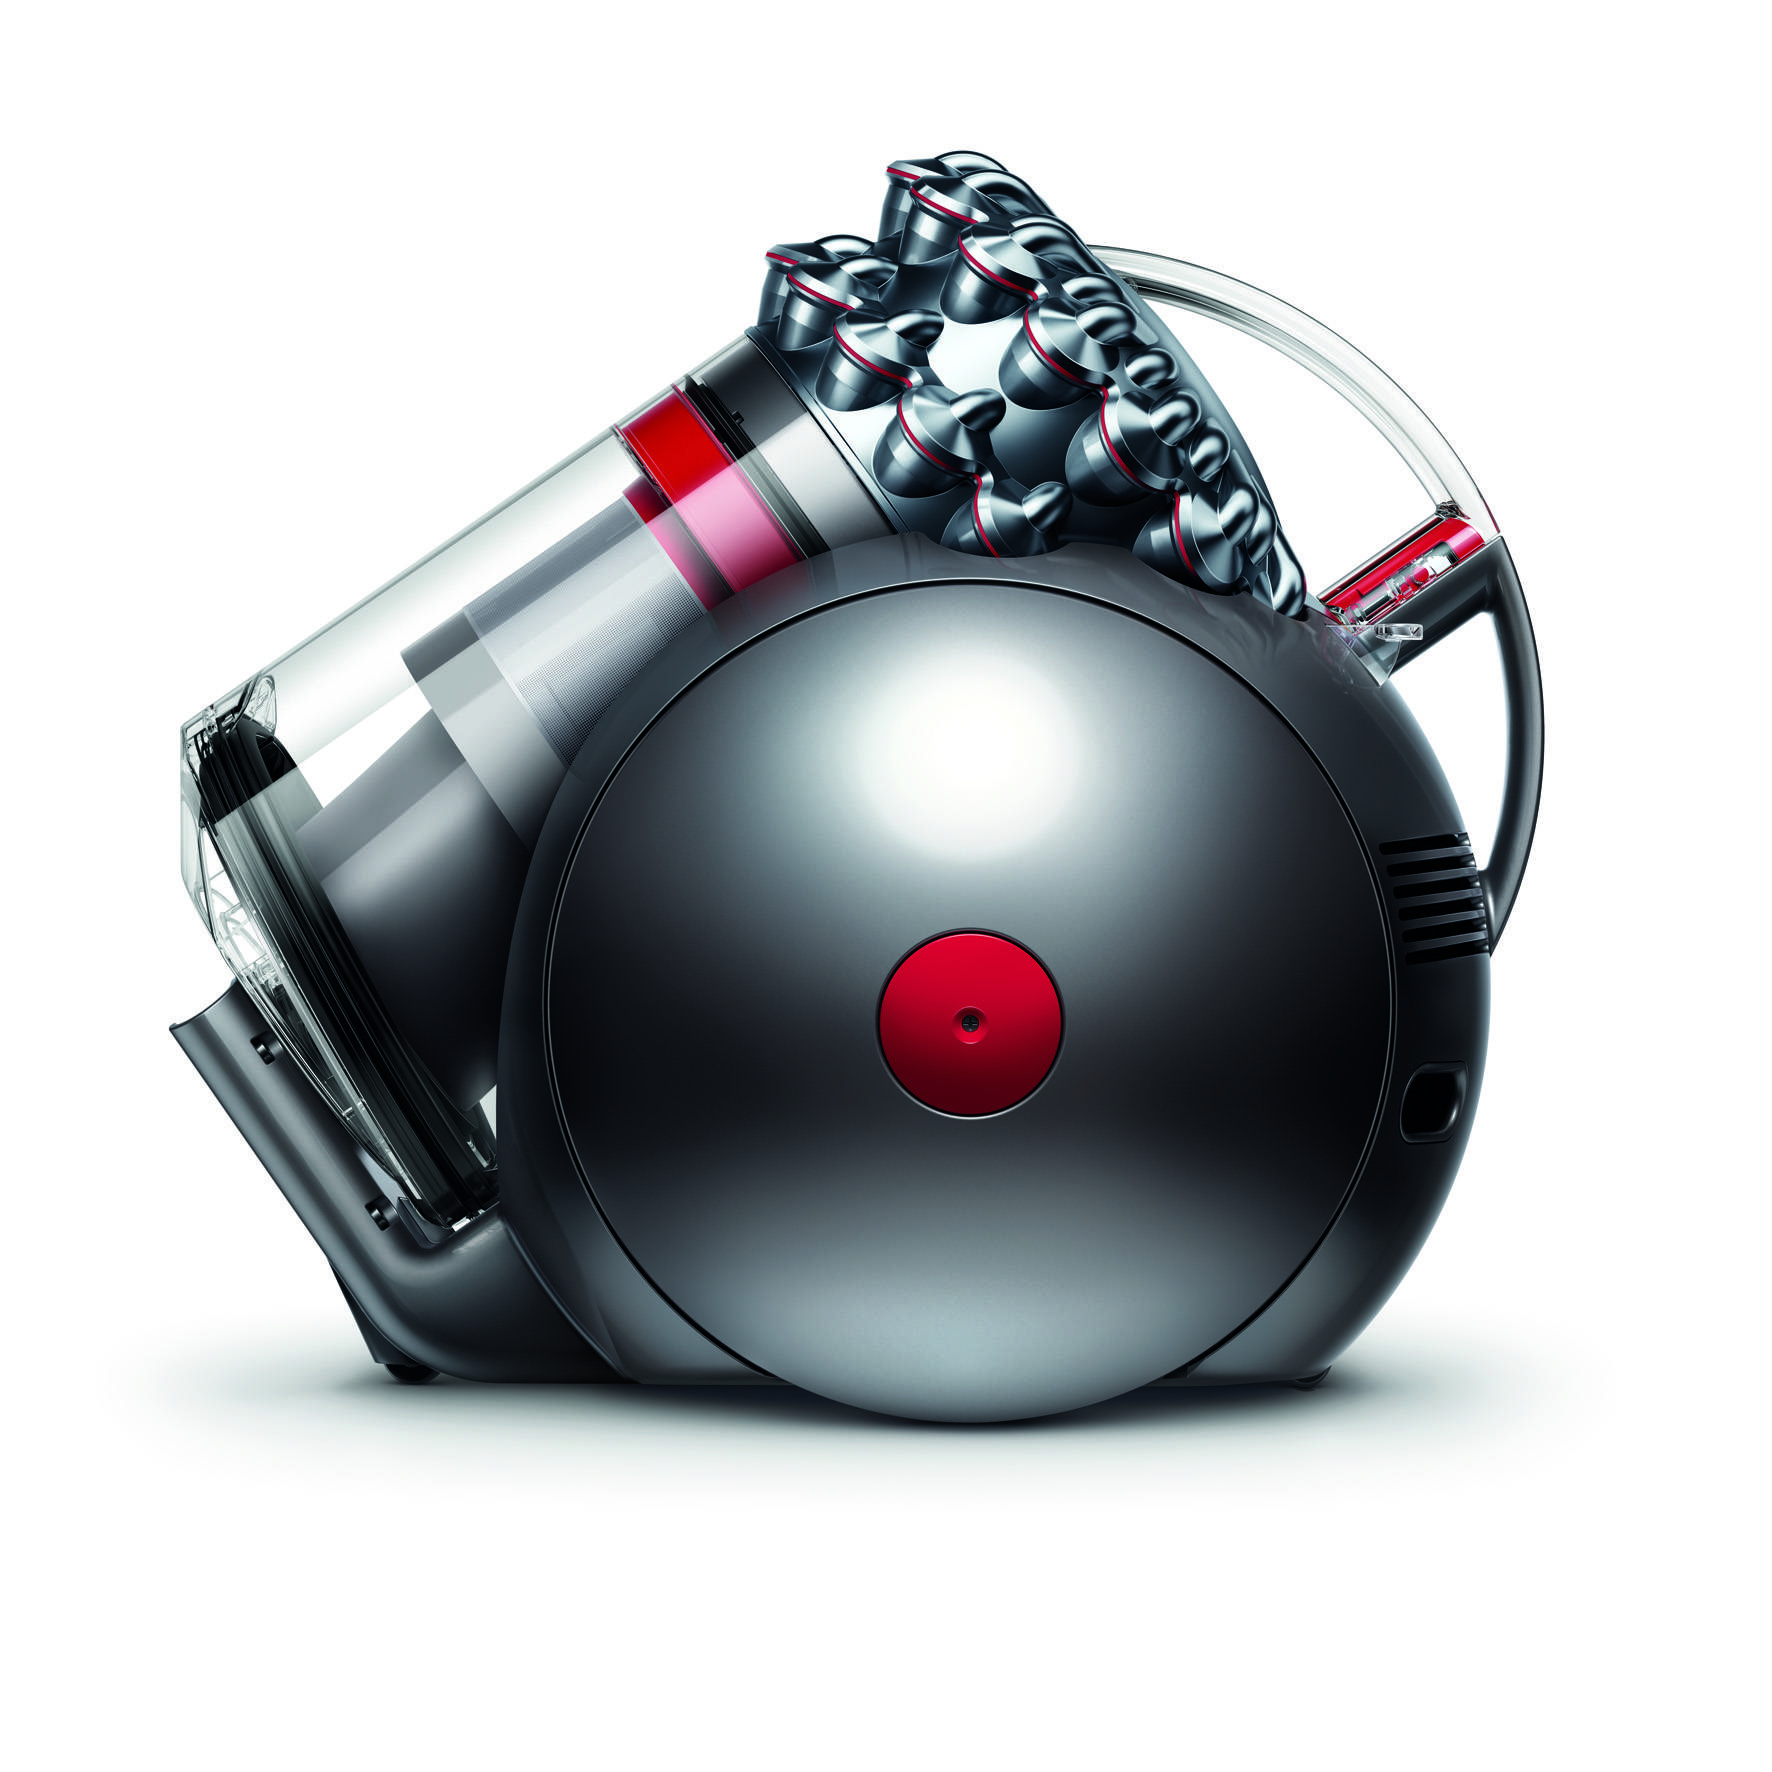 Dyson big ball parquet фен dyson supersonic отзывы парикмахеров